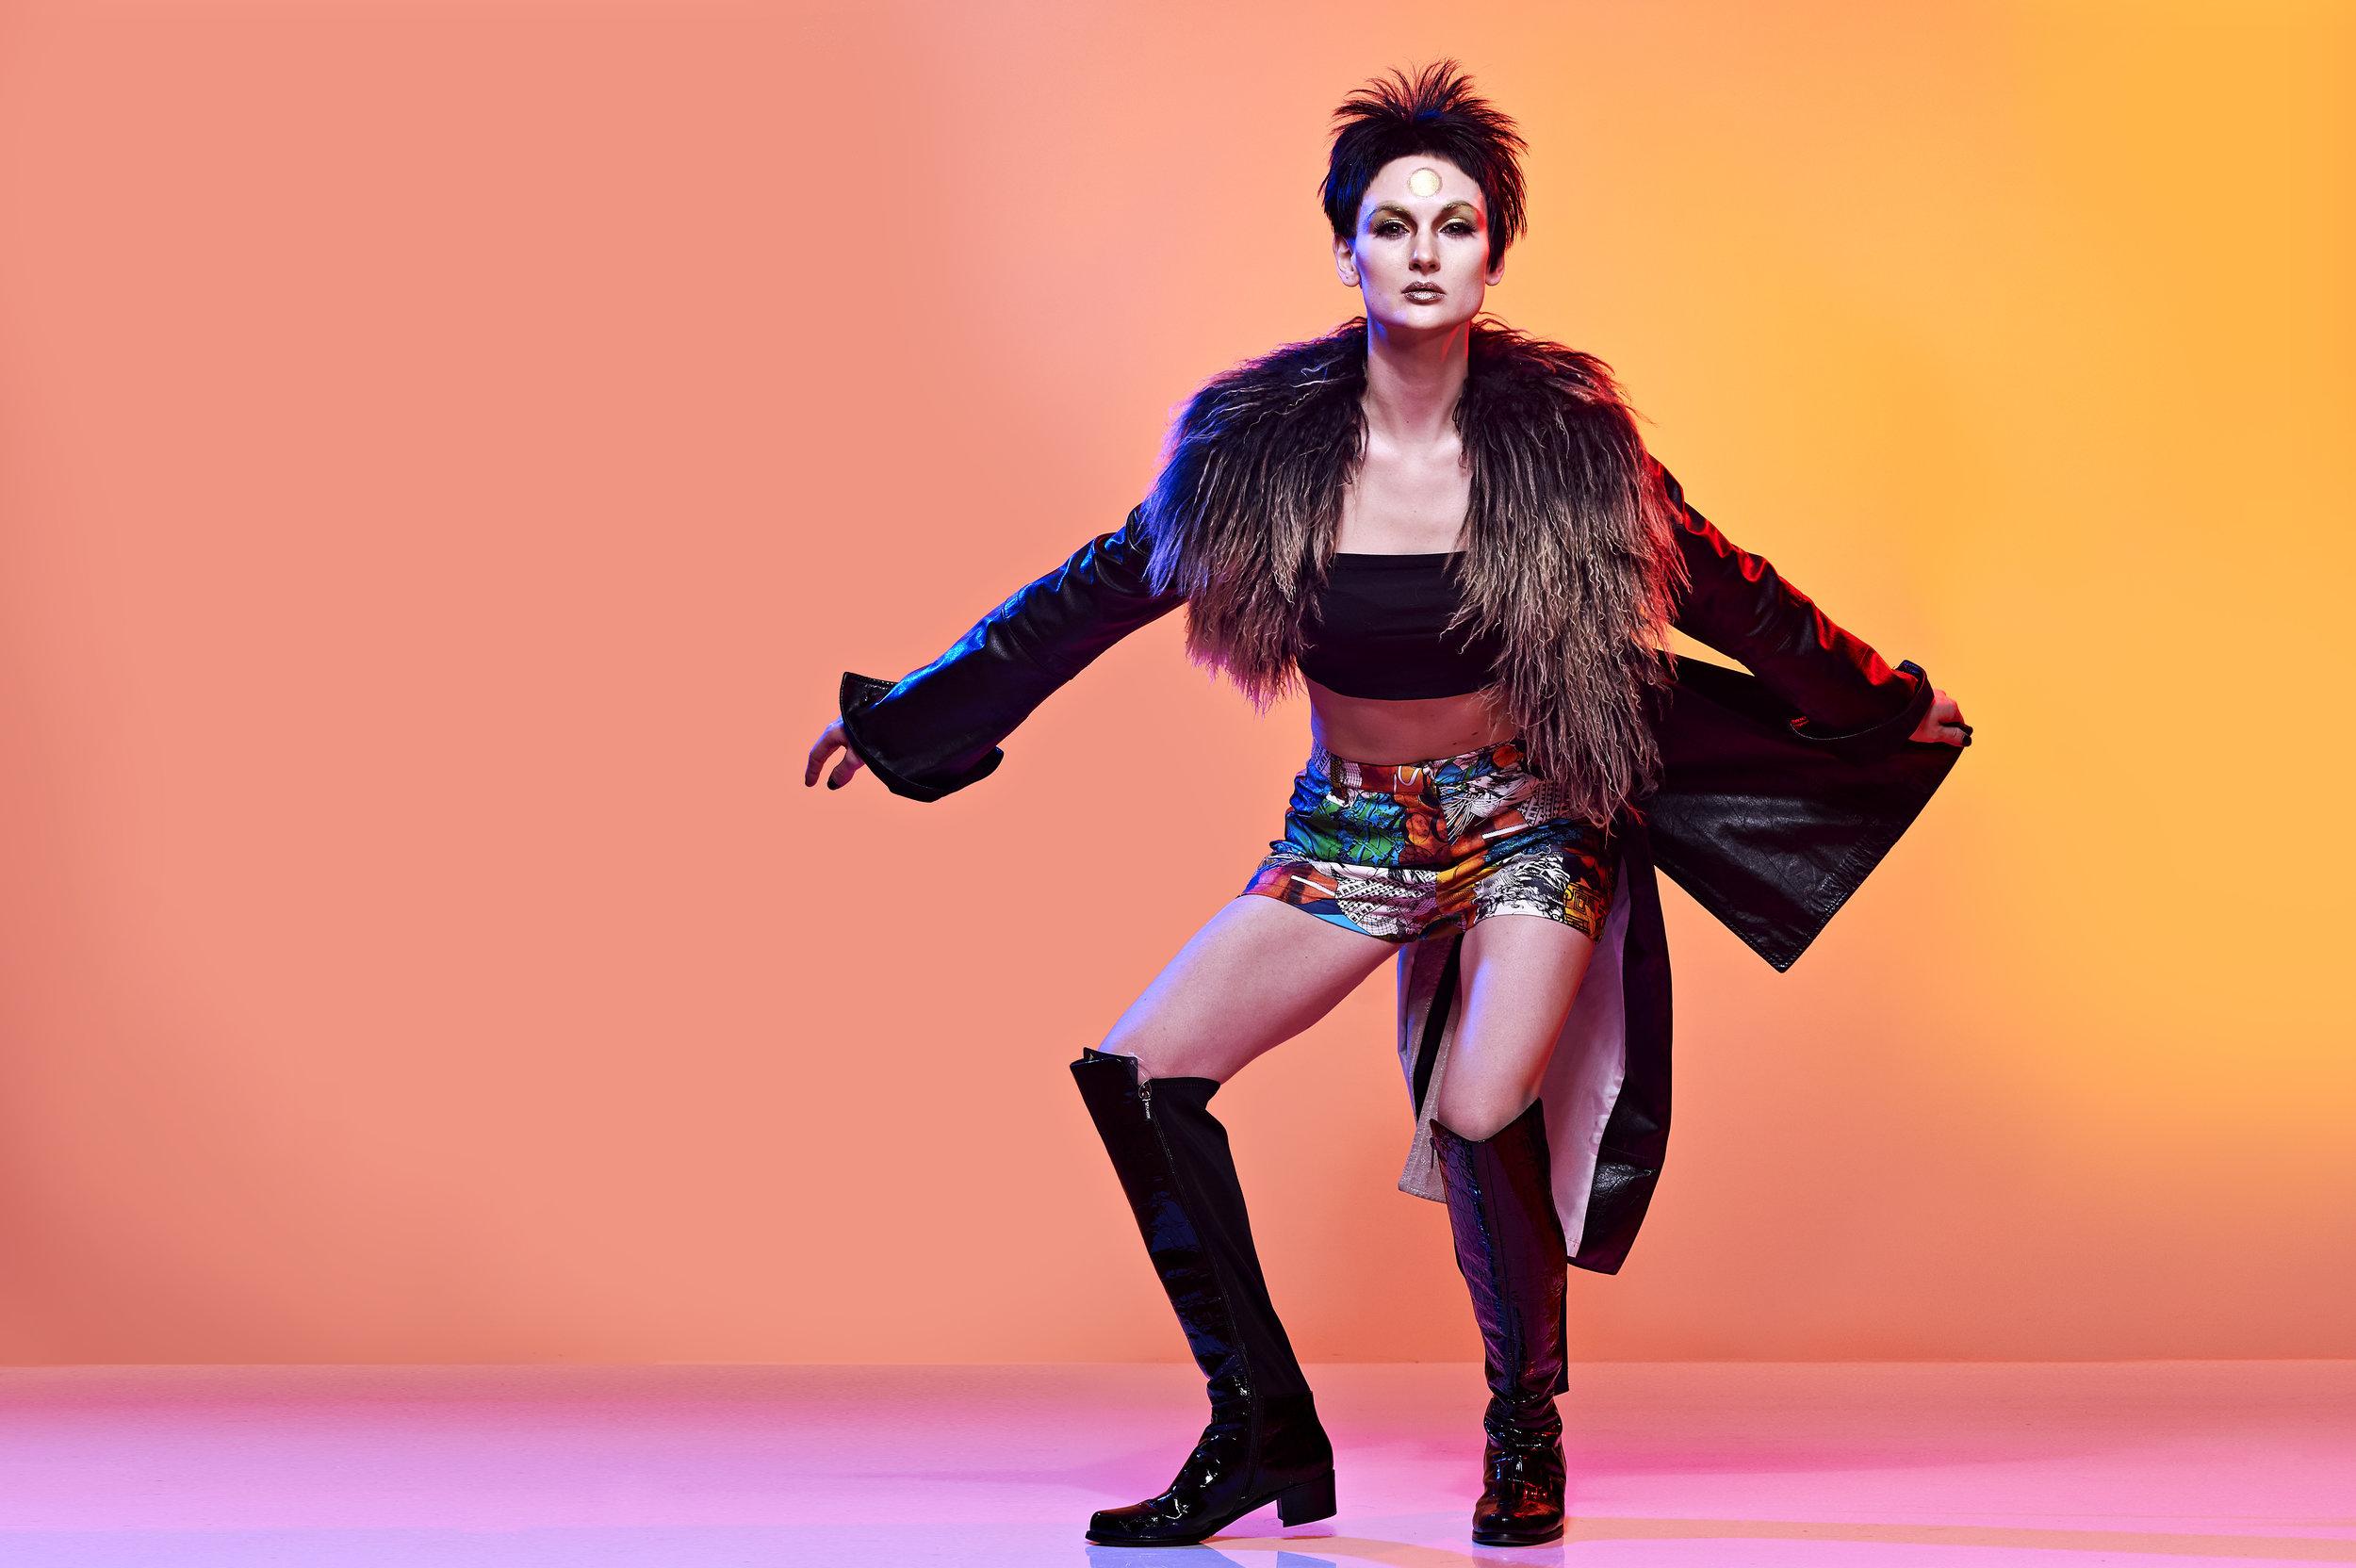 Marta-Hewson  - Urbanicity - David Bowie1706.jpg